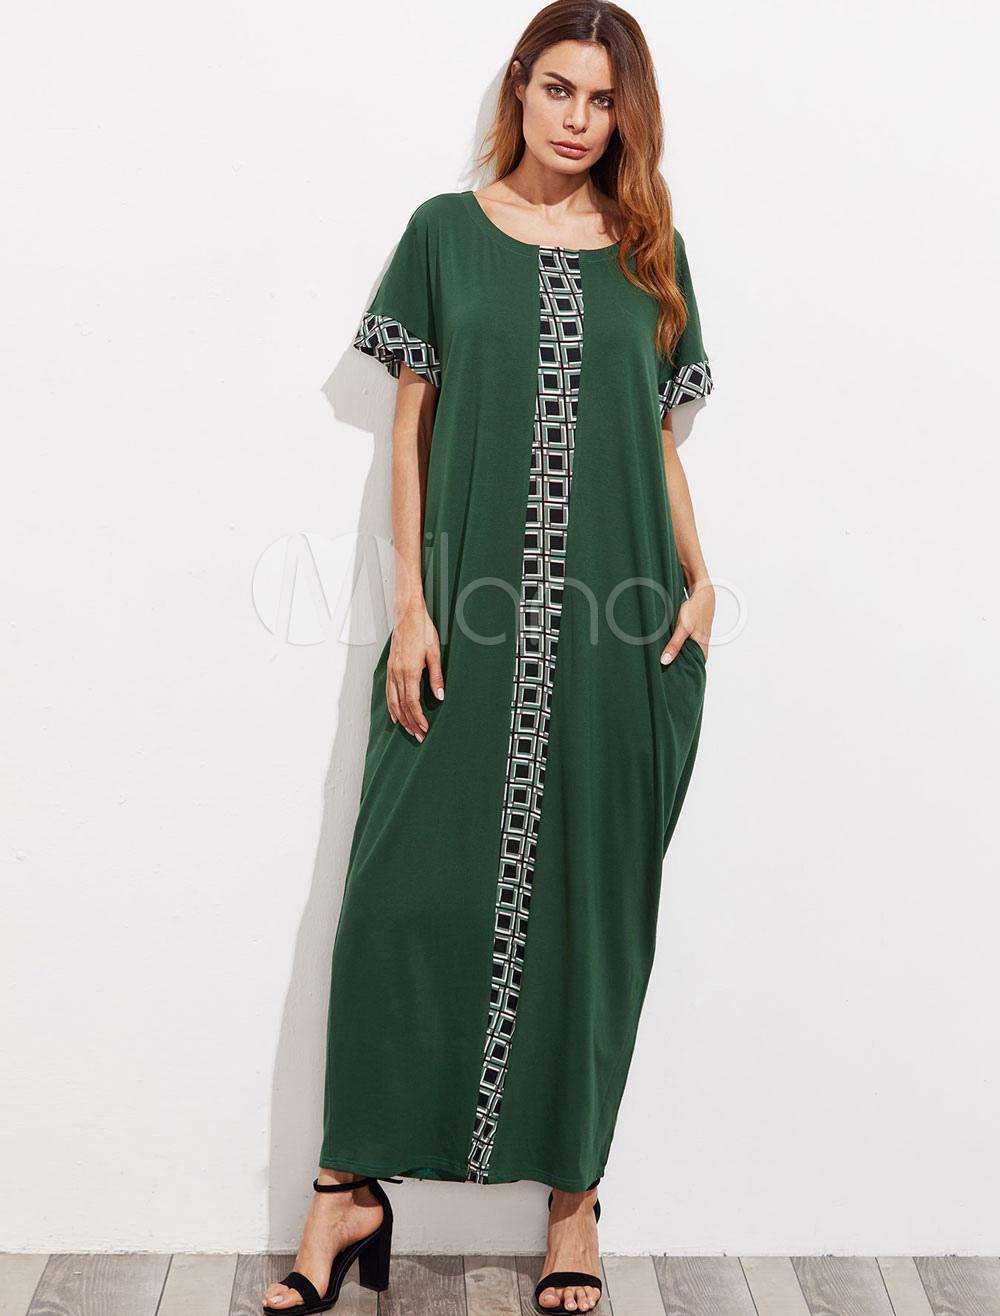 Maxi Kaftan Dress Women Tunic Dress Short Sleeve Oversized Jalabiya Dress (Women\\'s Clothing Arabian Clothing) photo